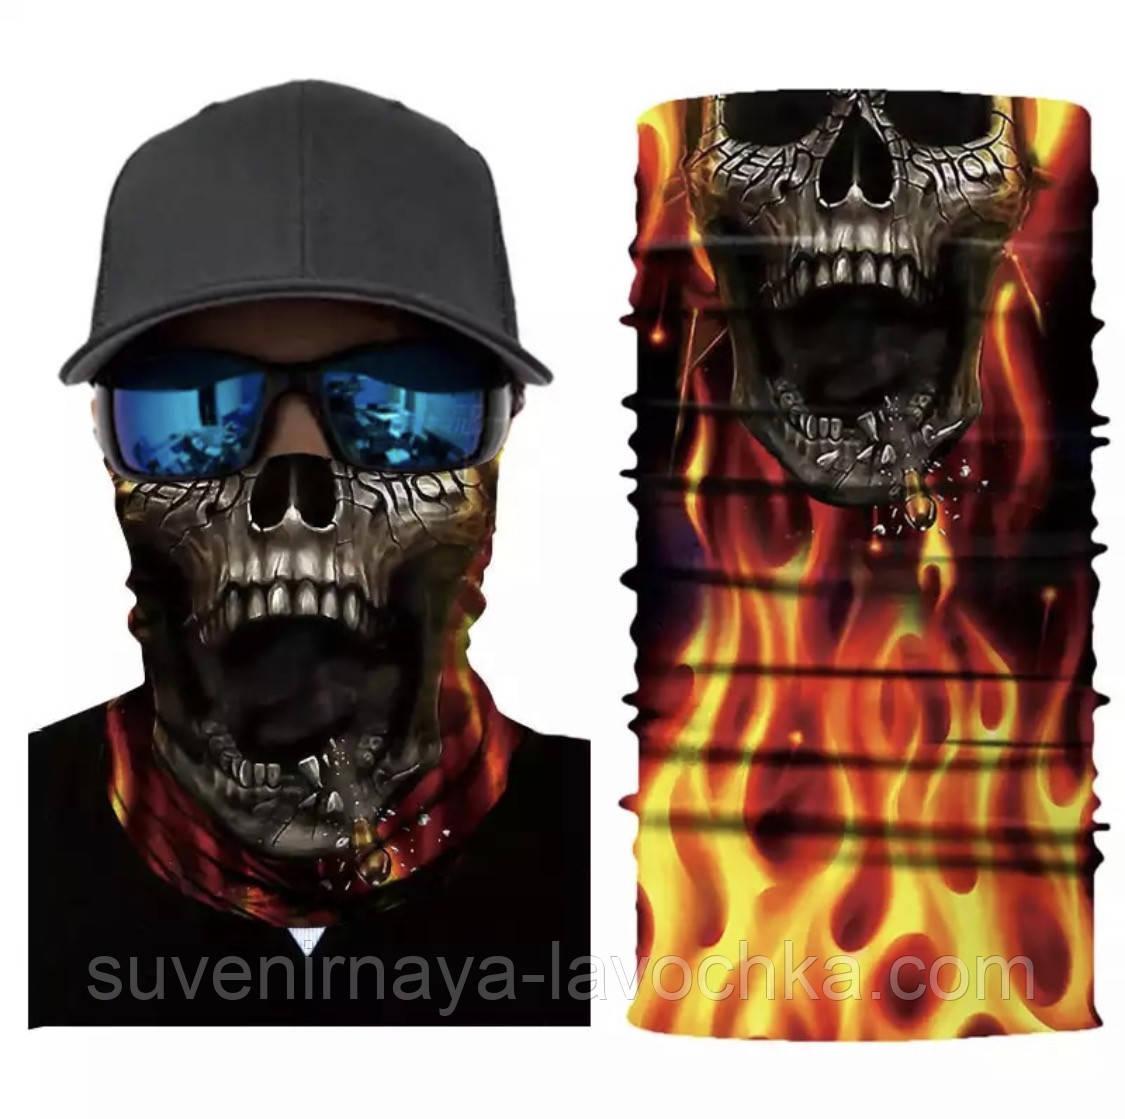 Мото бафф  Fire from the underworld. Качественная маска на лицо